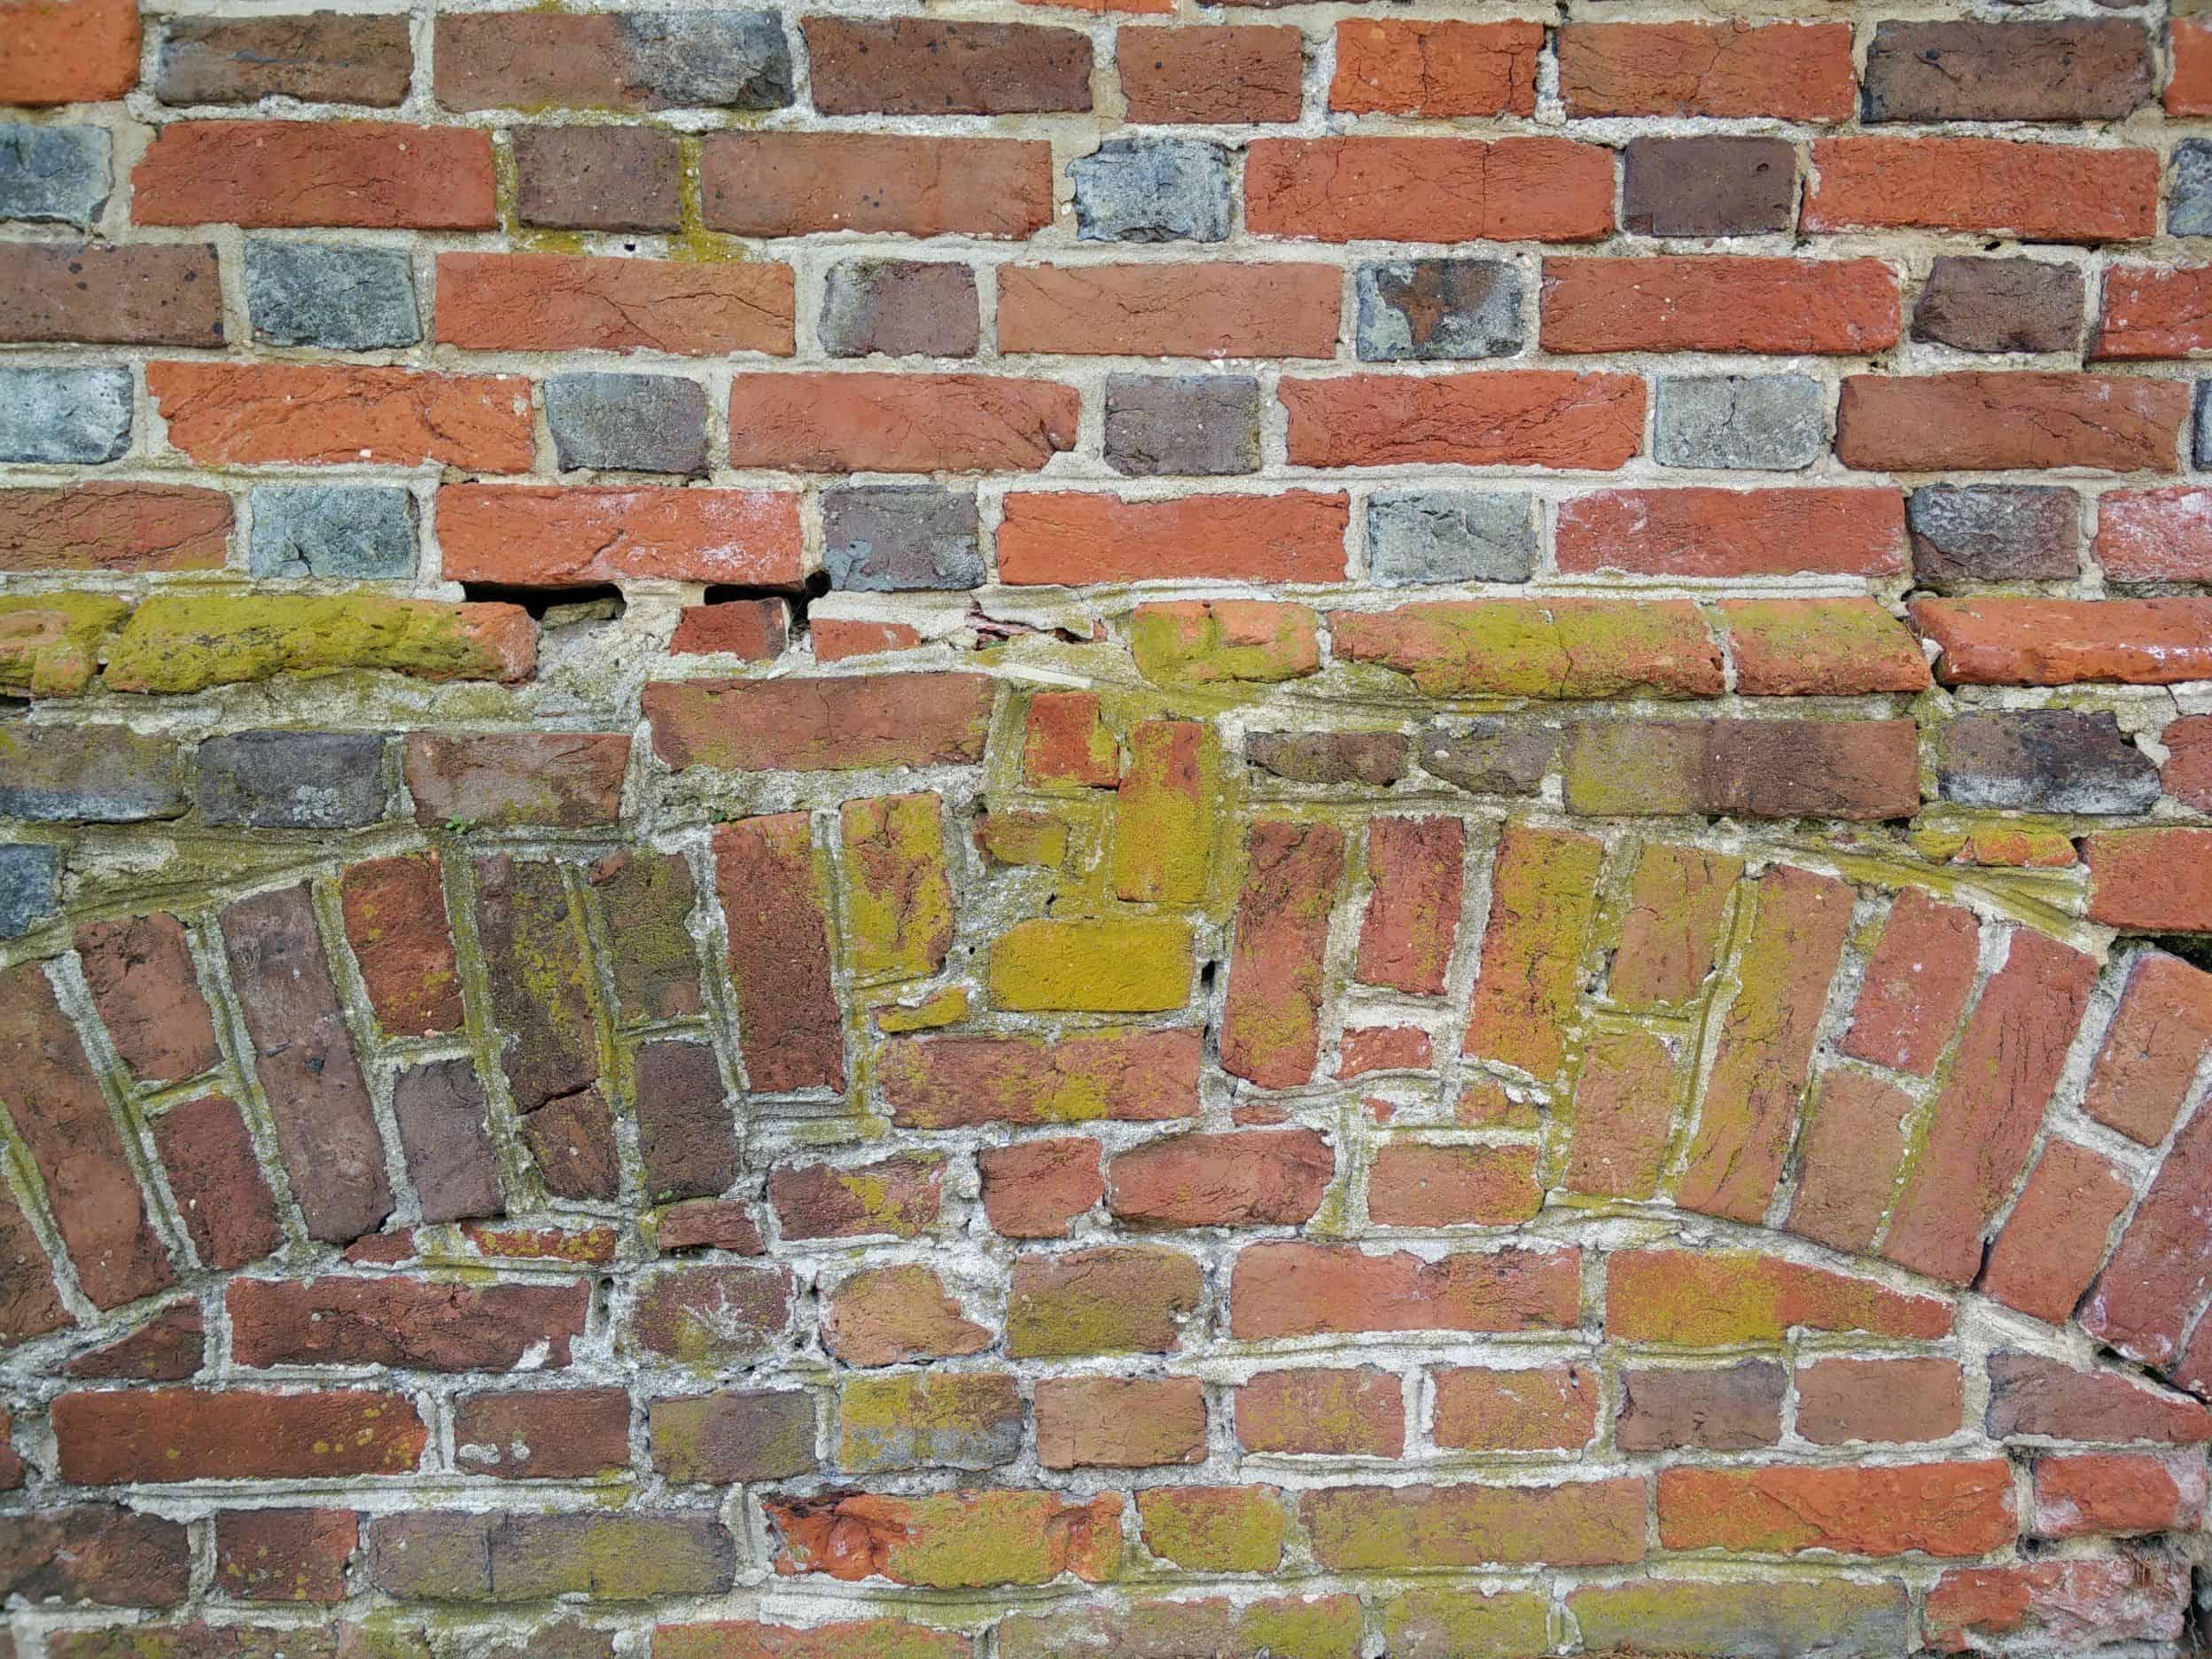 bricks one